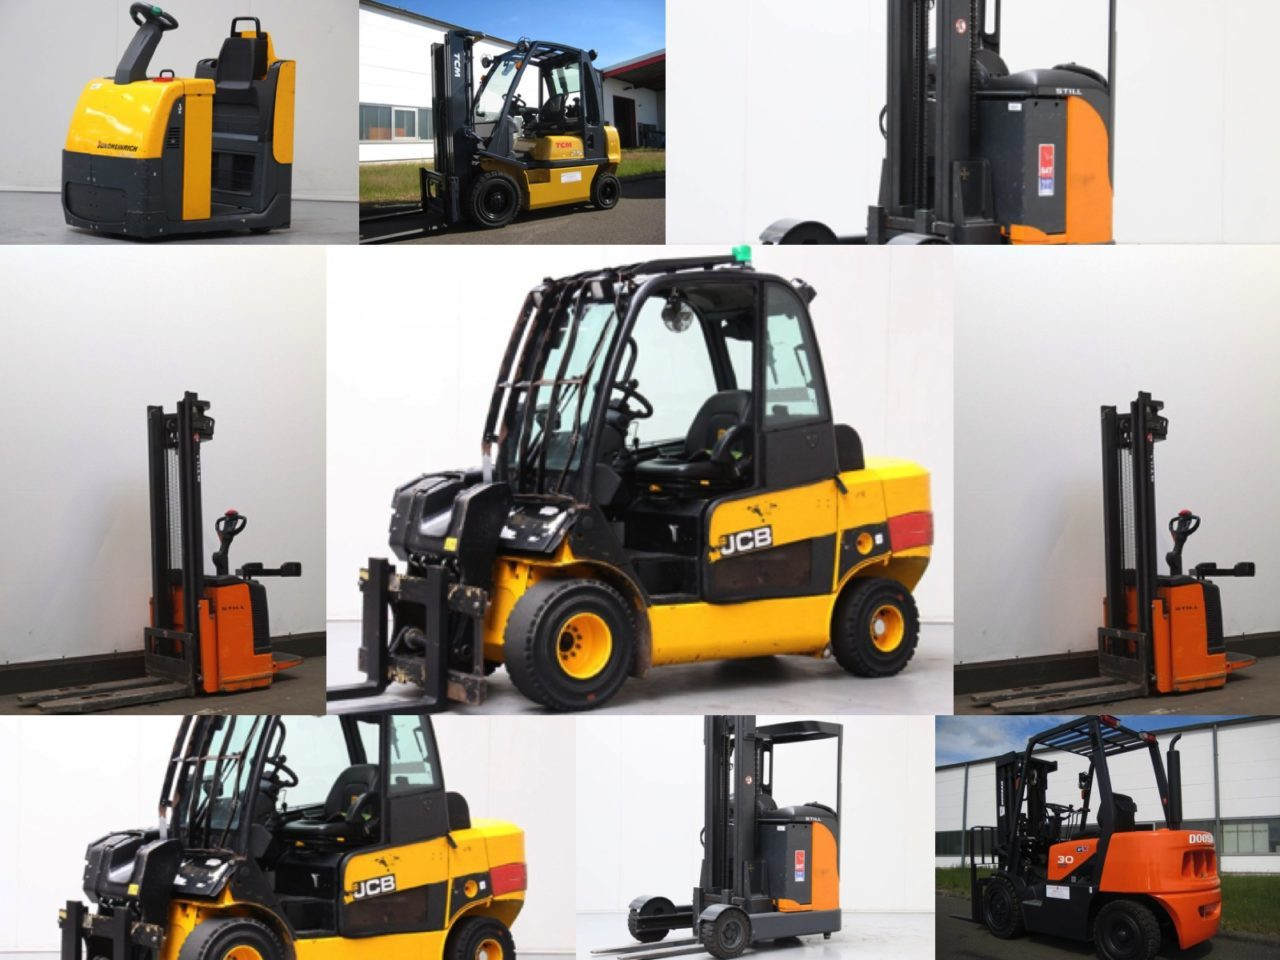 Used Forklifts, Generators, Material Handling Equipment